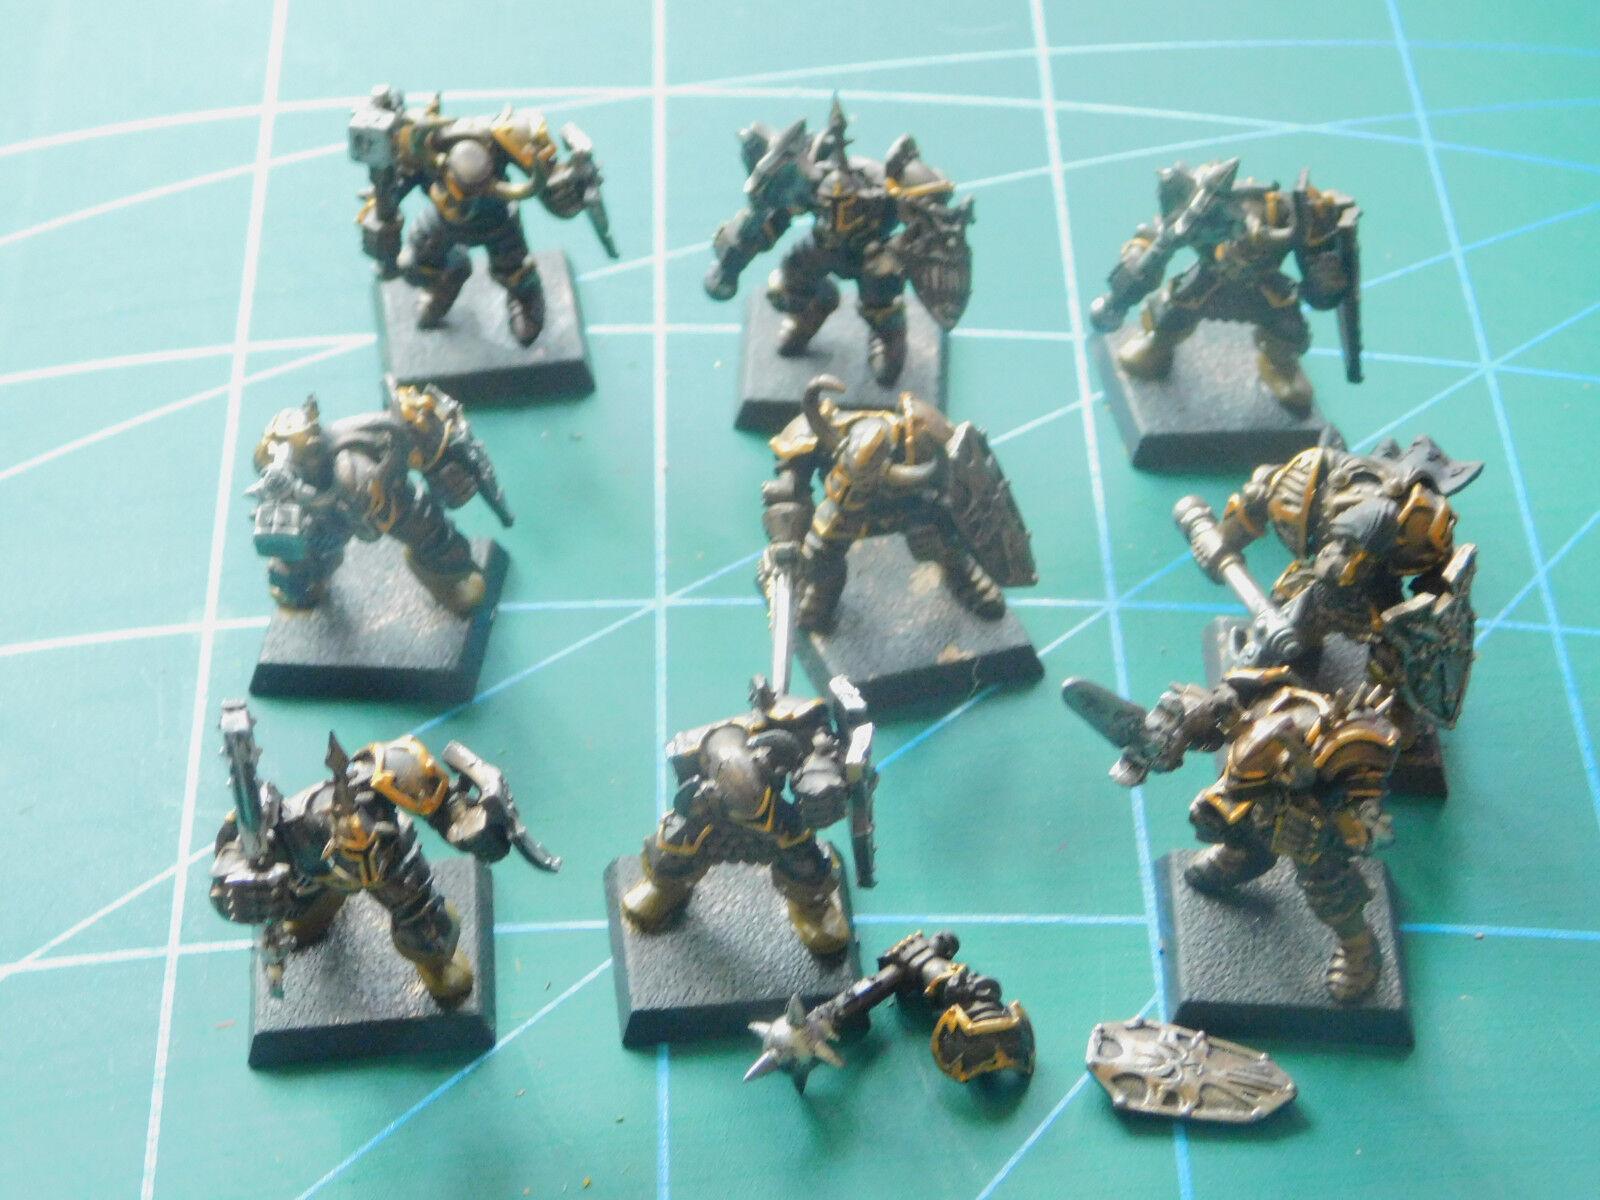 9 warhammer 40k dungeons space marine painted plastic figures